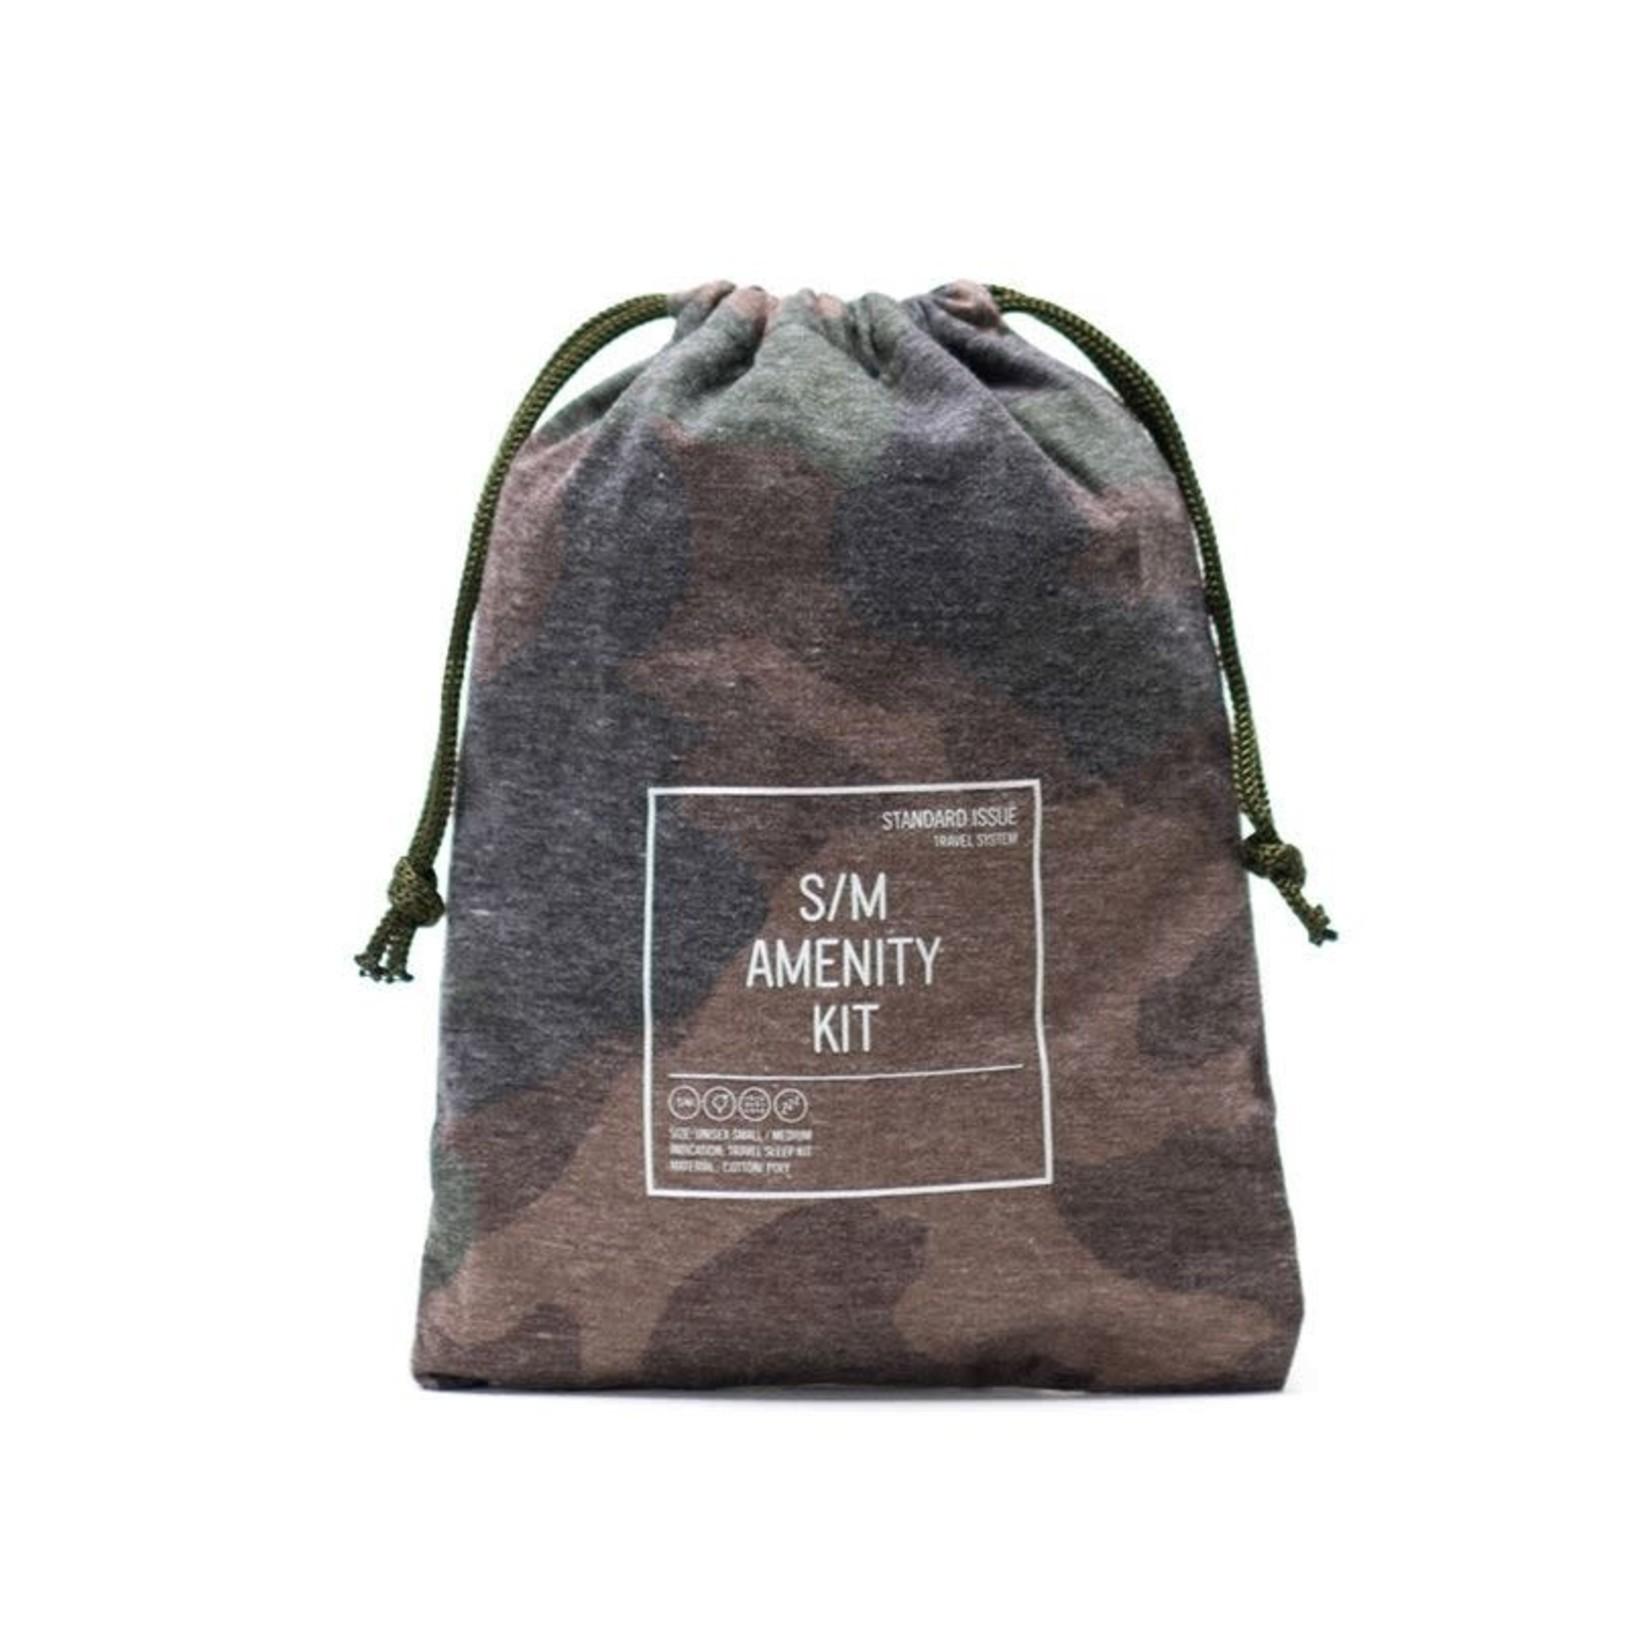 Herschel Herschel : Amenity Cotton Poly Travel Kit Camo O/S